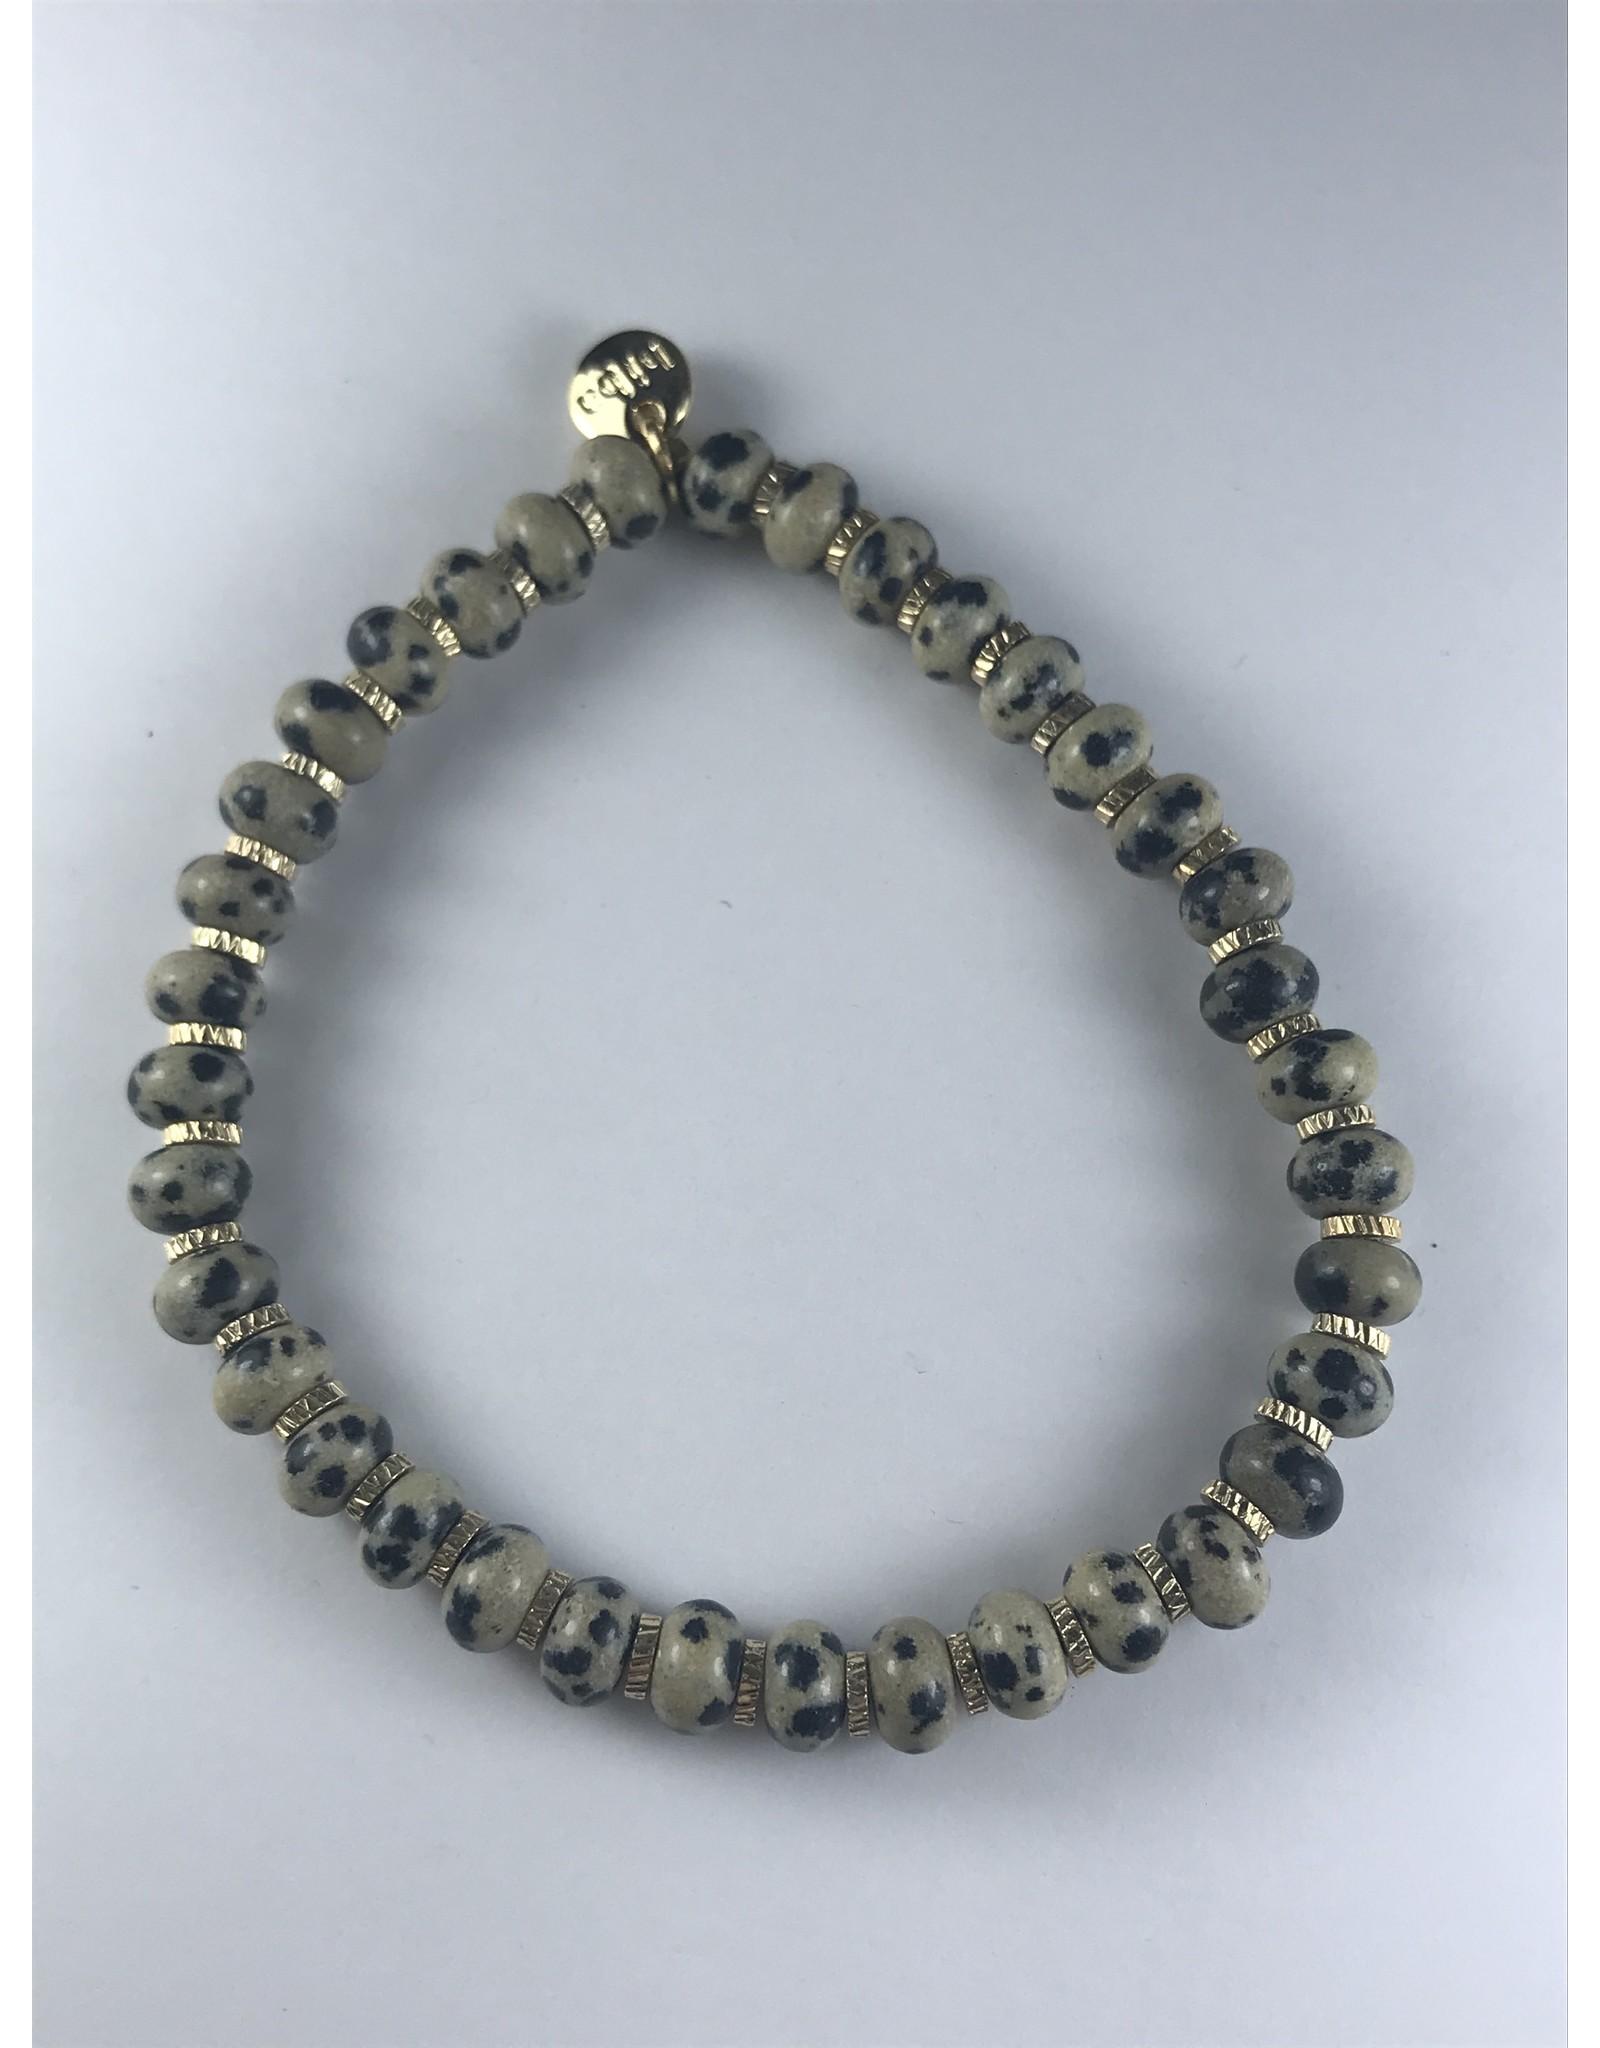 Biba stevige armband - beige-grijze kralen op fijne gouden armband